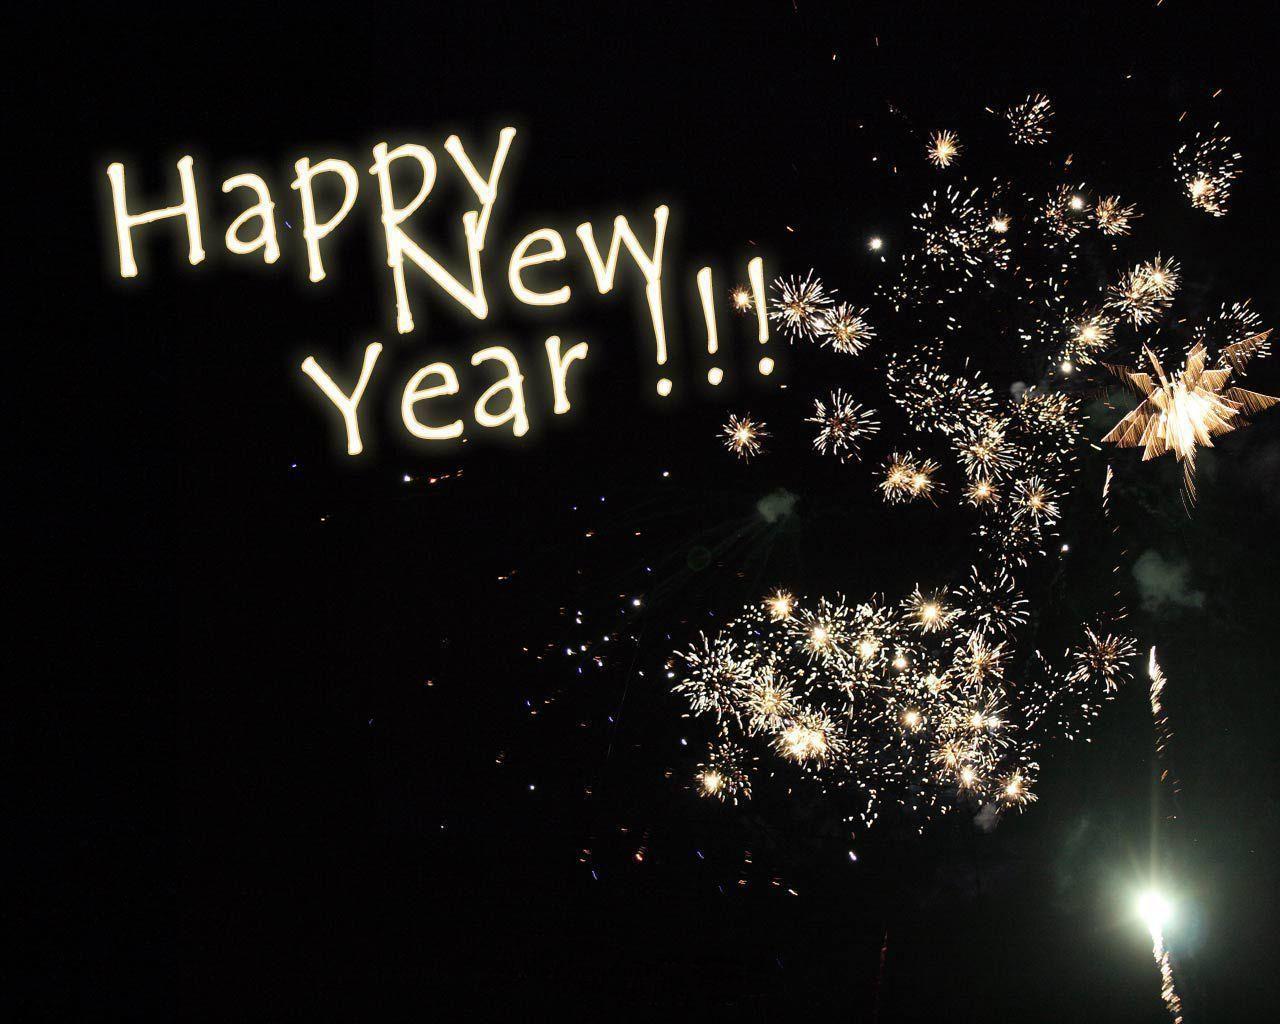 Happy New Year Wallpaper Hd Download Free 2 Happy New Year Images New Year Wallpaper Happy New Year Wallpaper